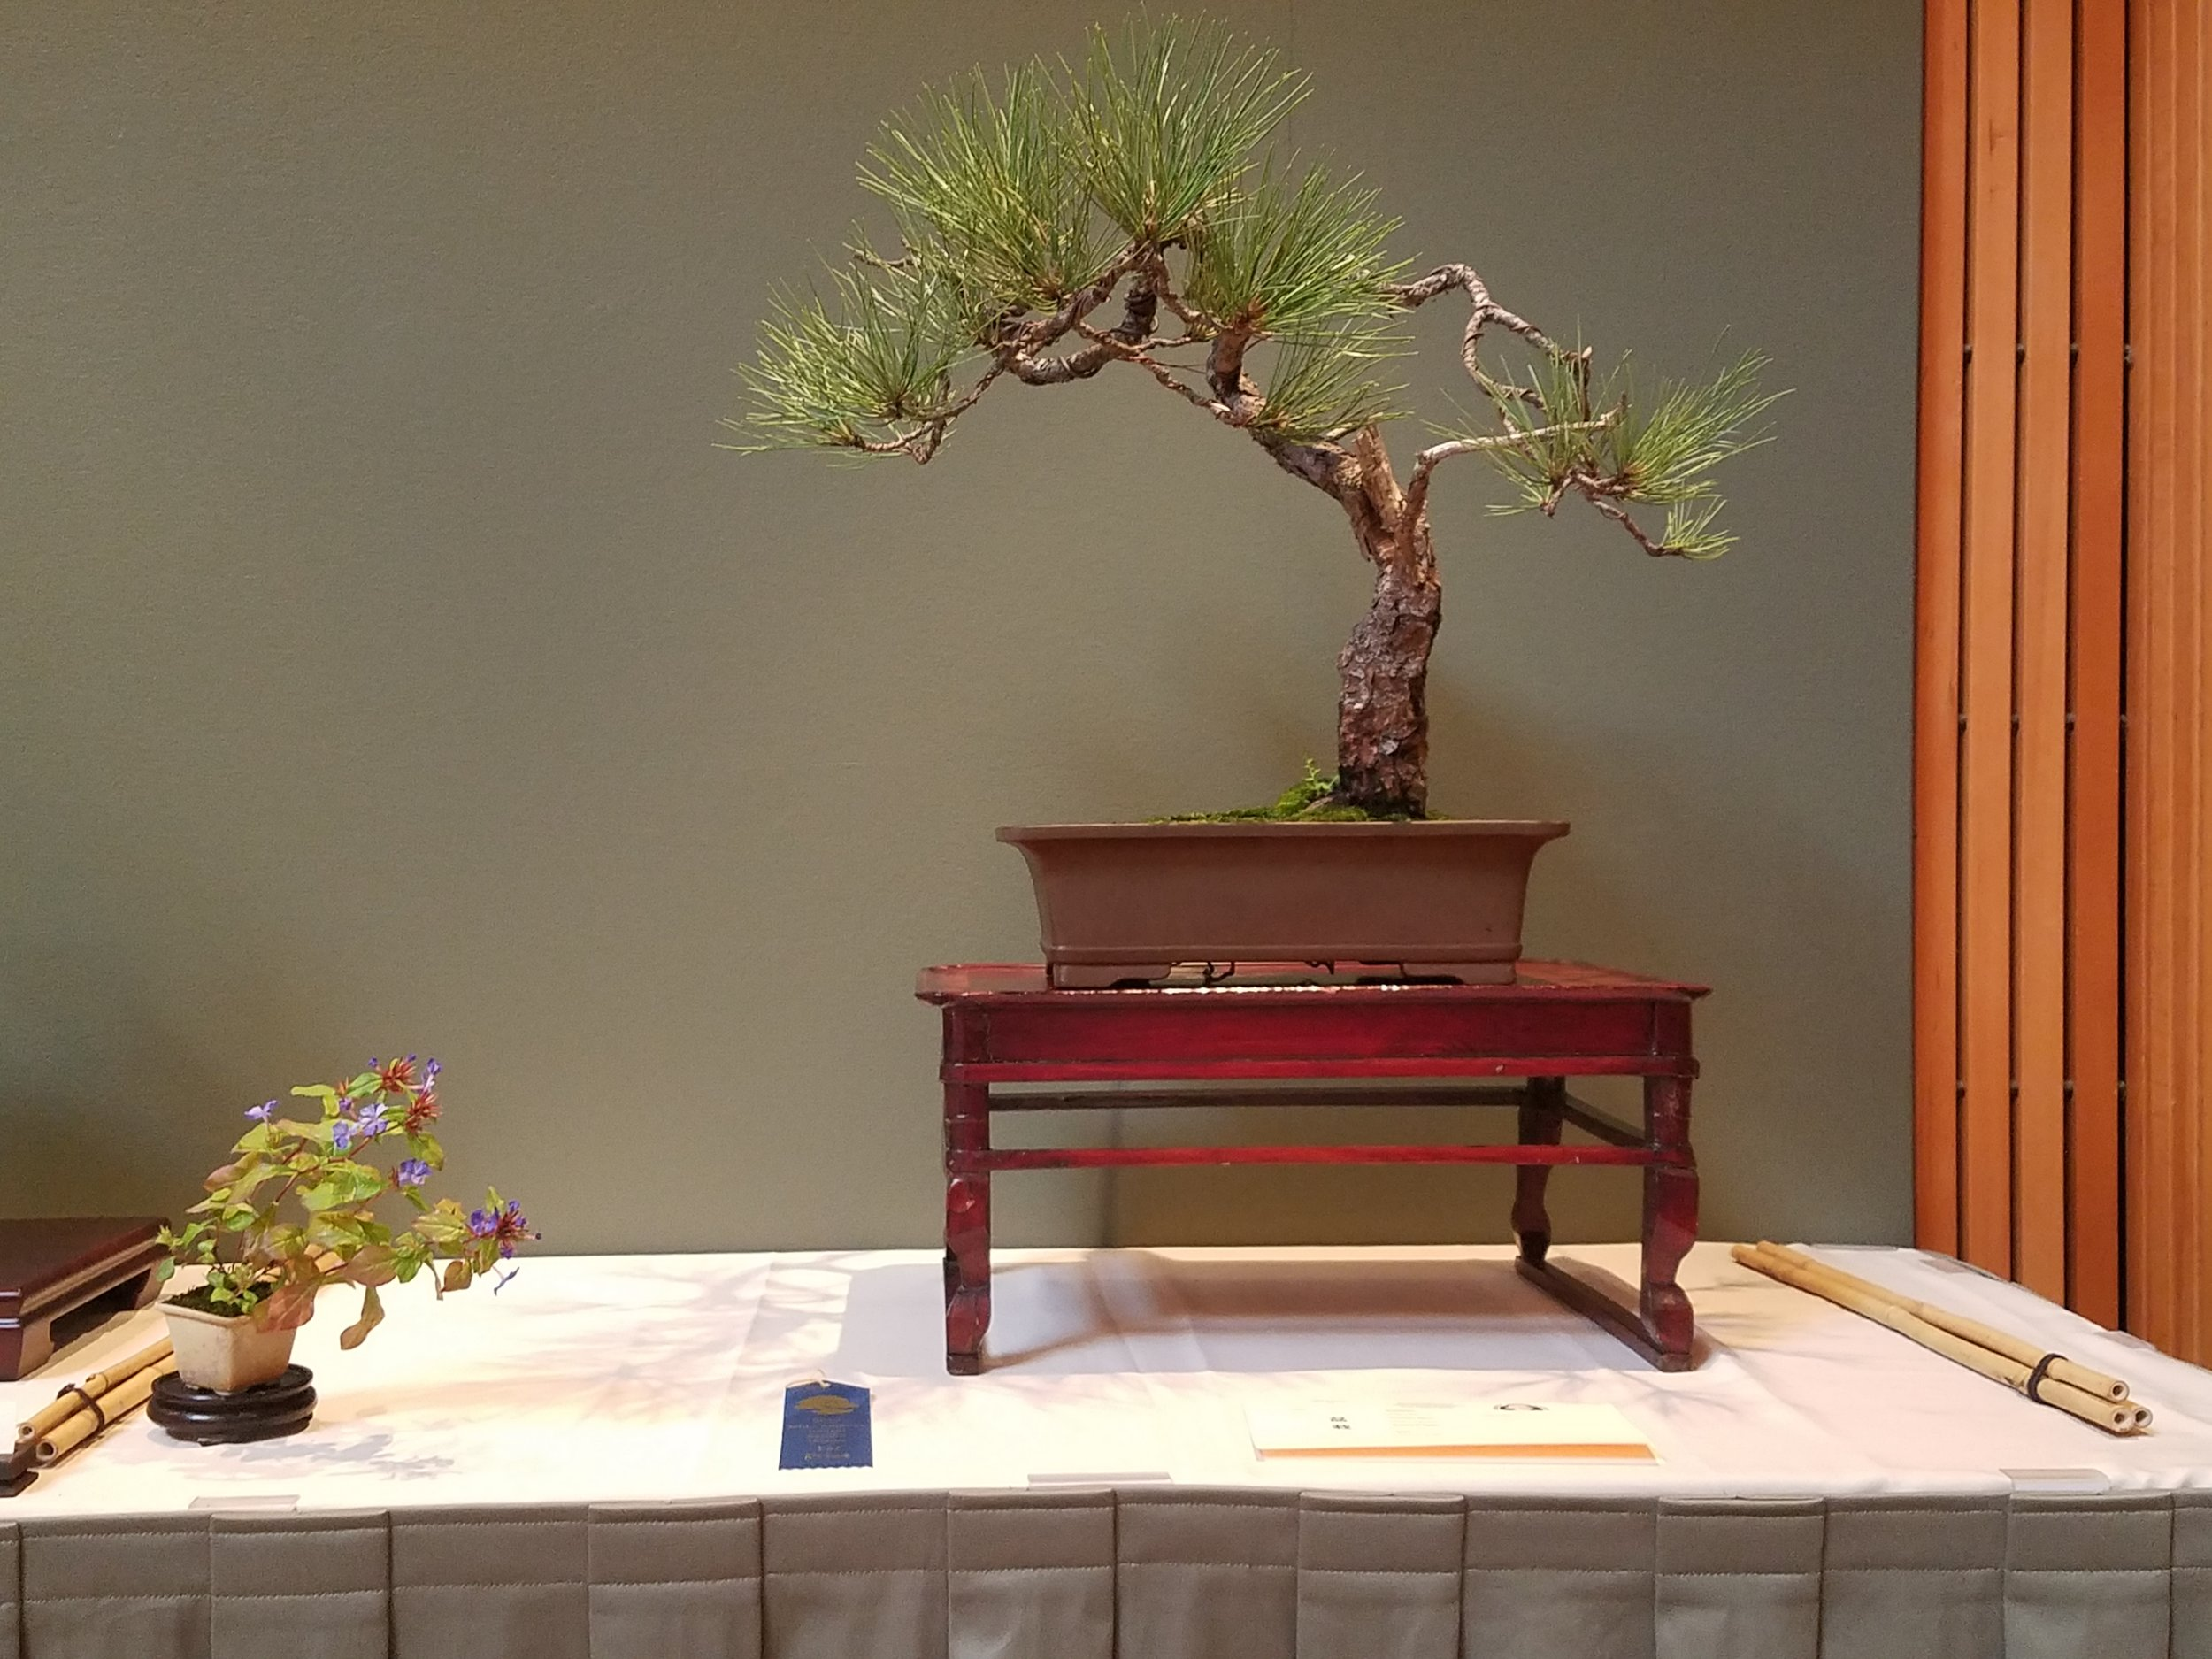 2017 Mid-America Bonsai Exhibition - Ponderosa Pine - Informal Upright